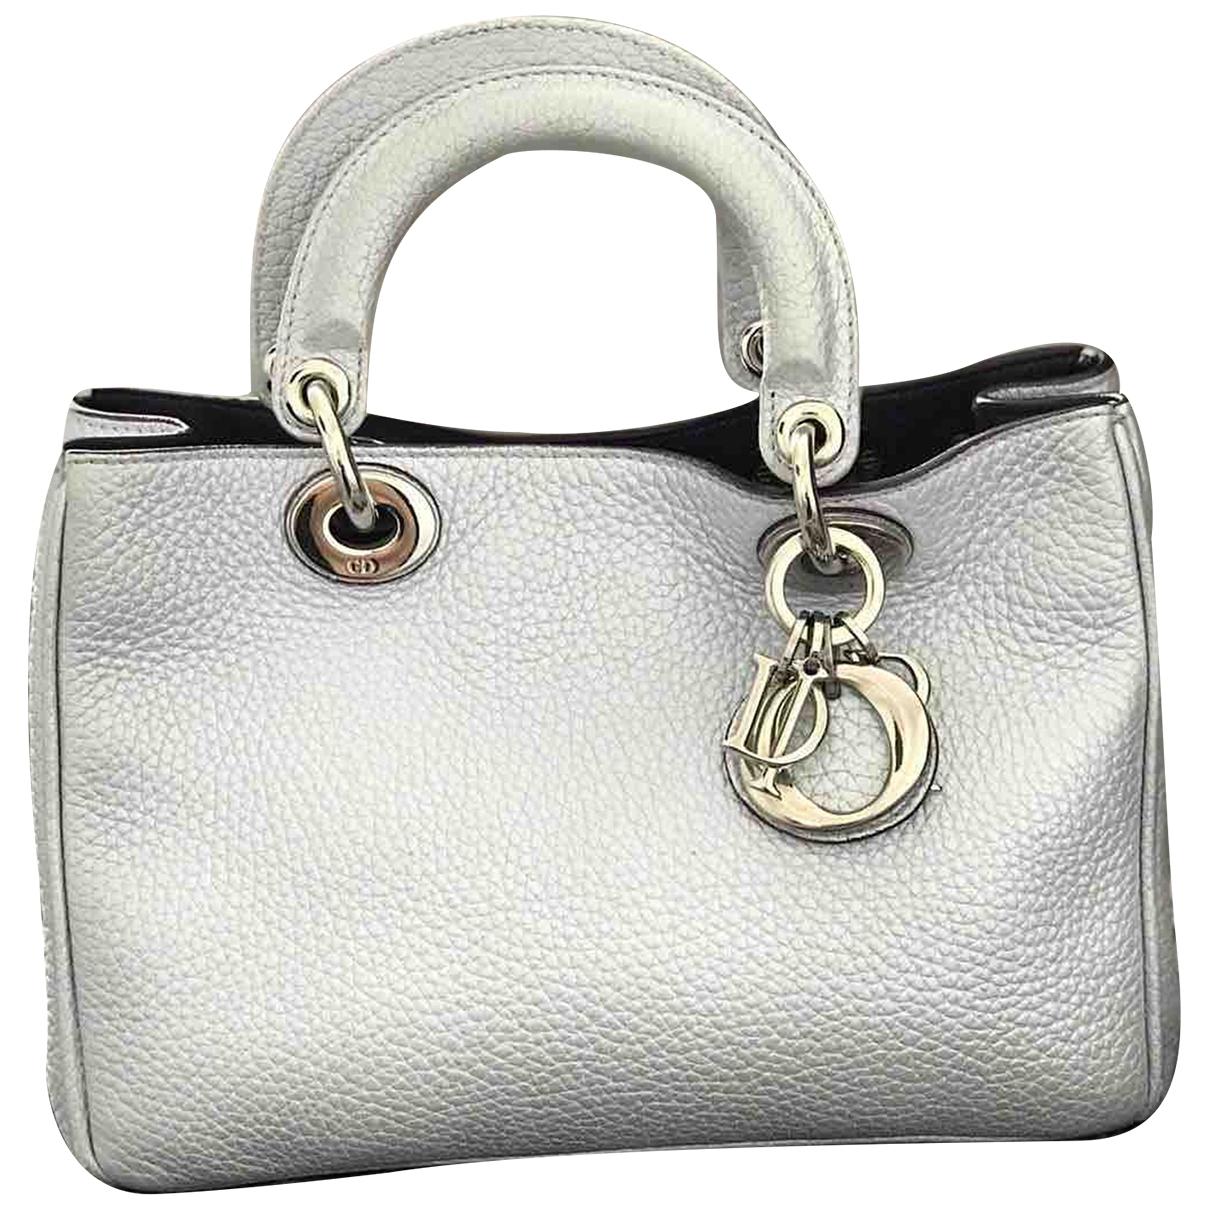 Dior Diorissimo Handtasche in  Silber Leder